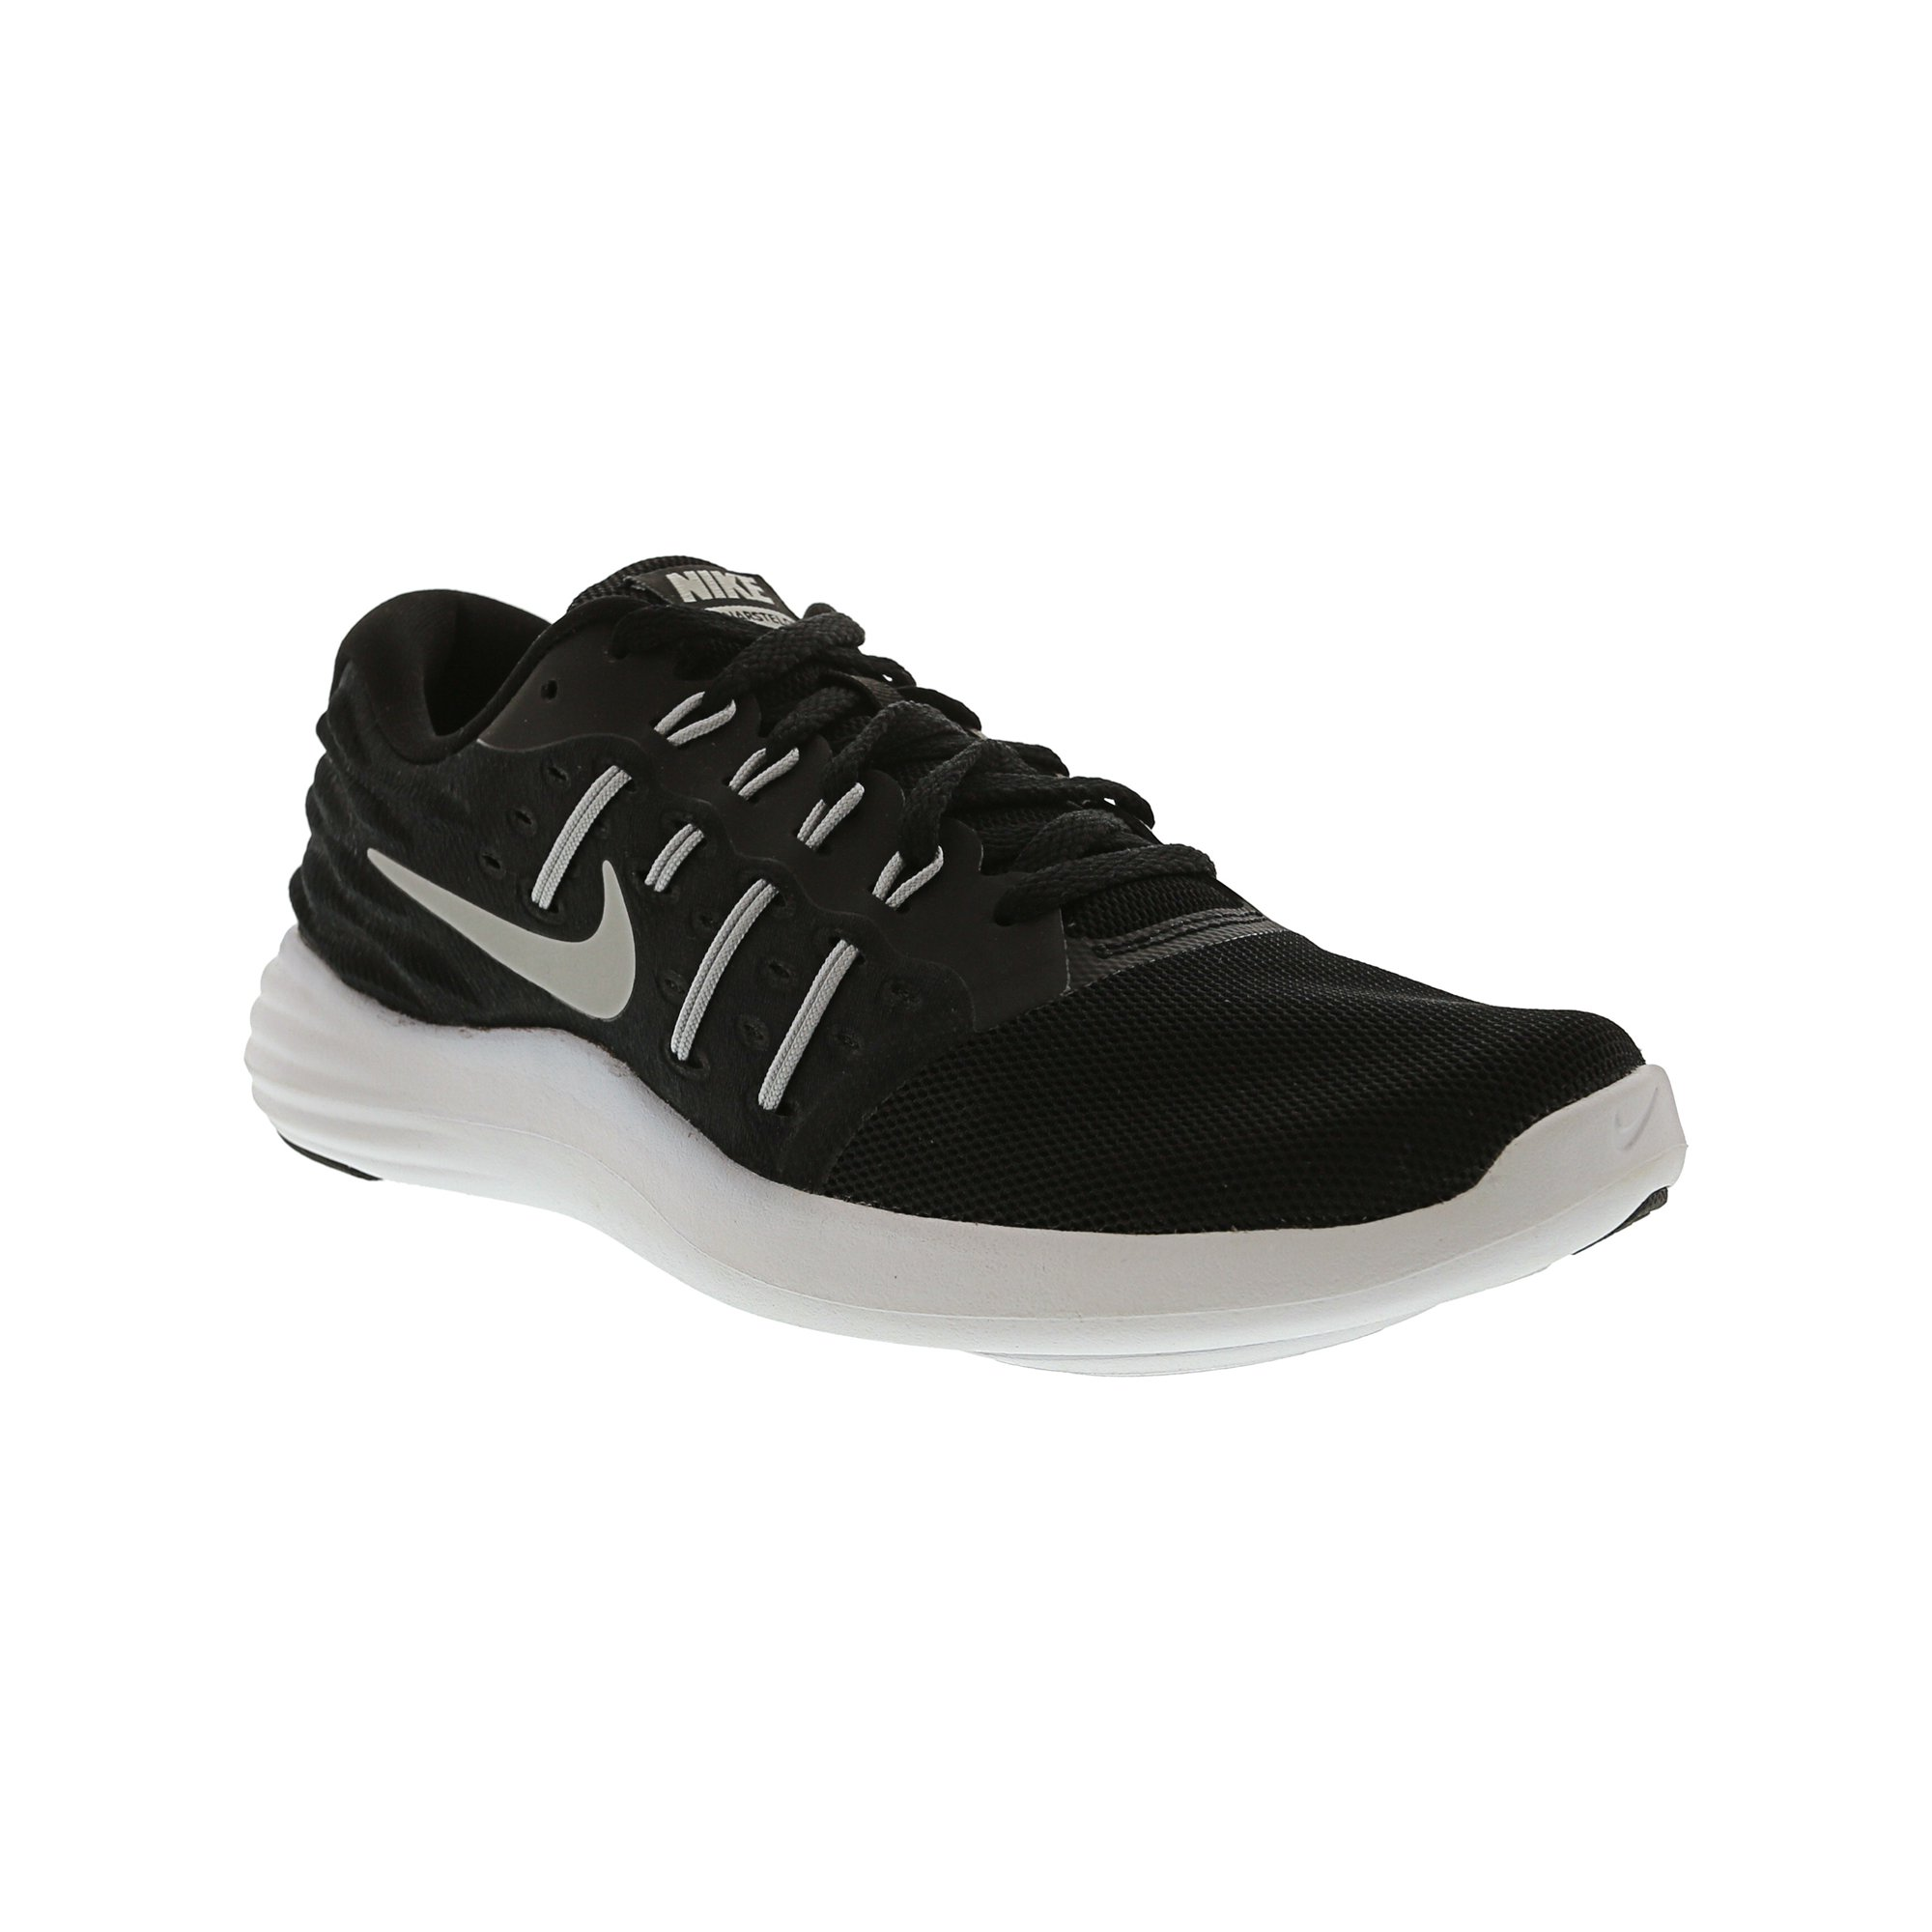 4768bdffa4612 Nike Women s Lunarstelos Black   Metallic Silver Ankle-High Walking Shoe -  9.5M